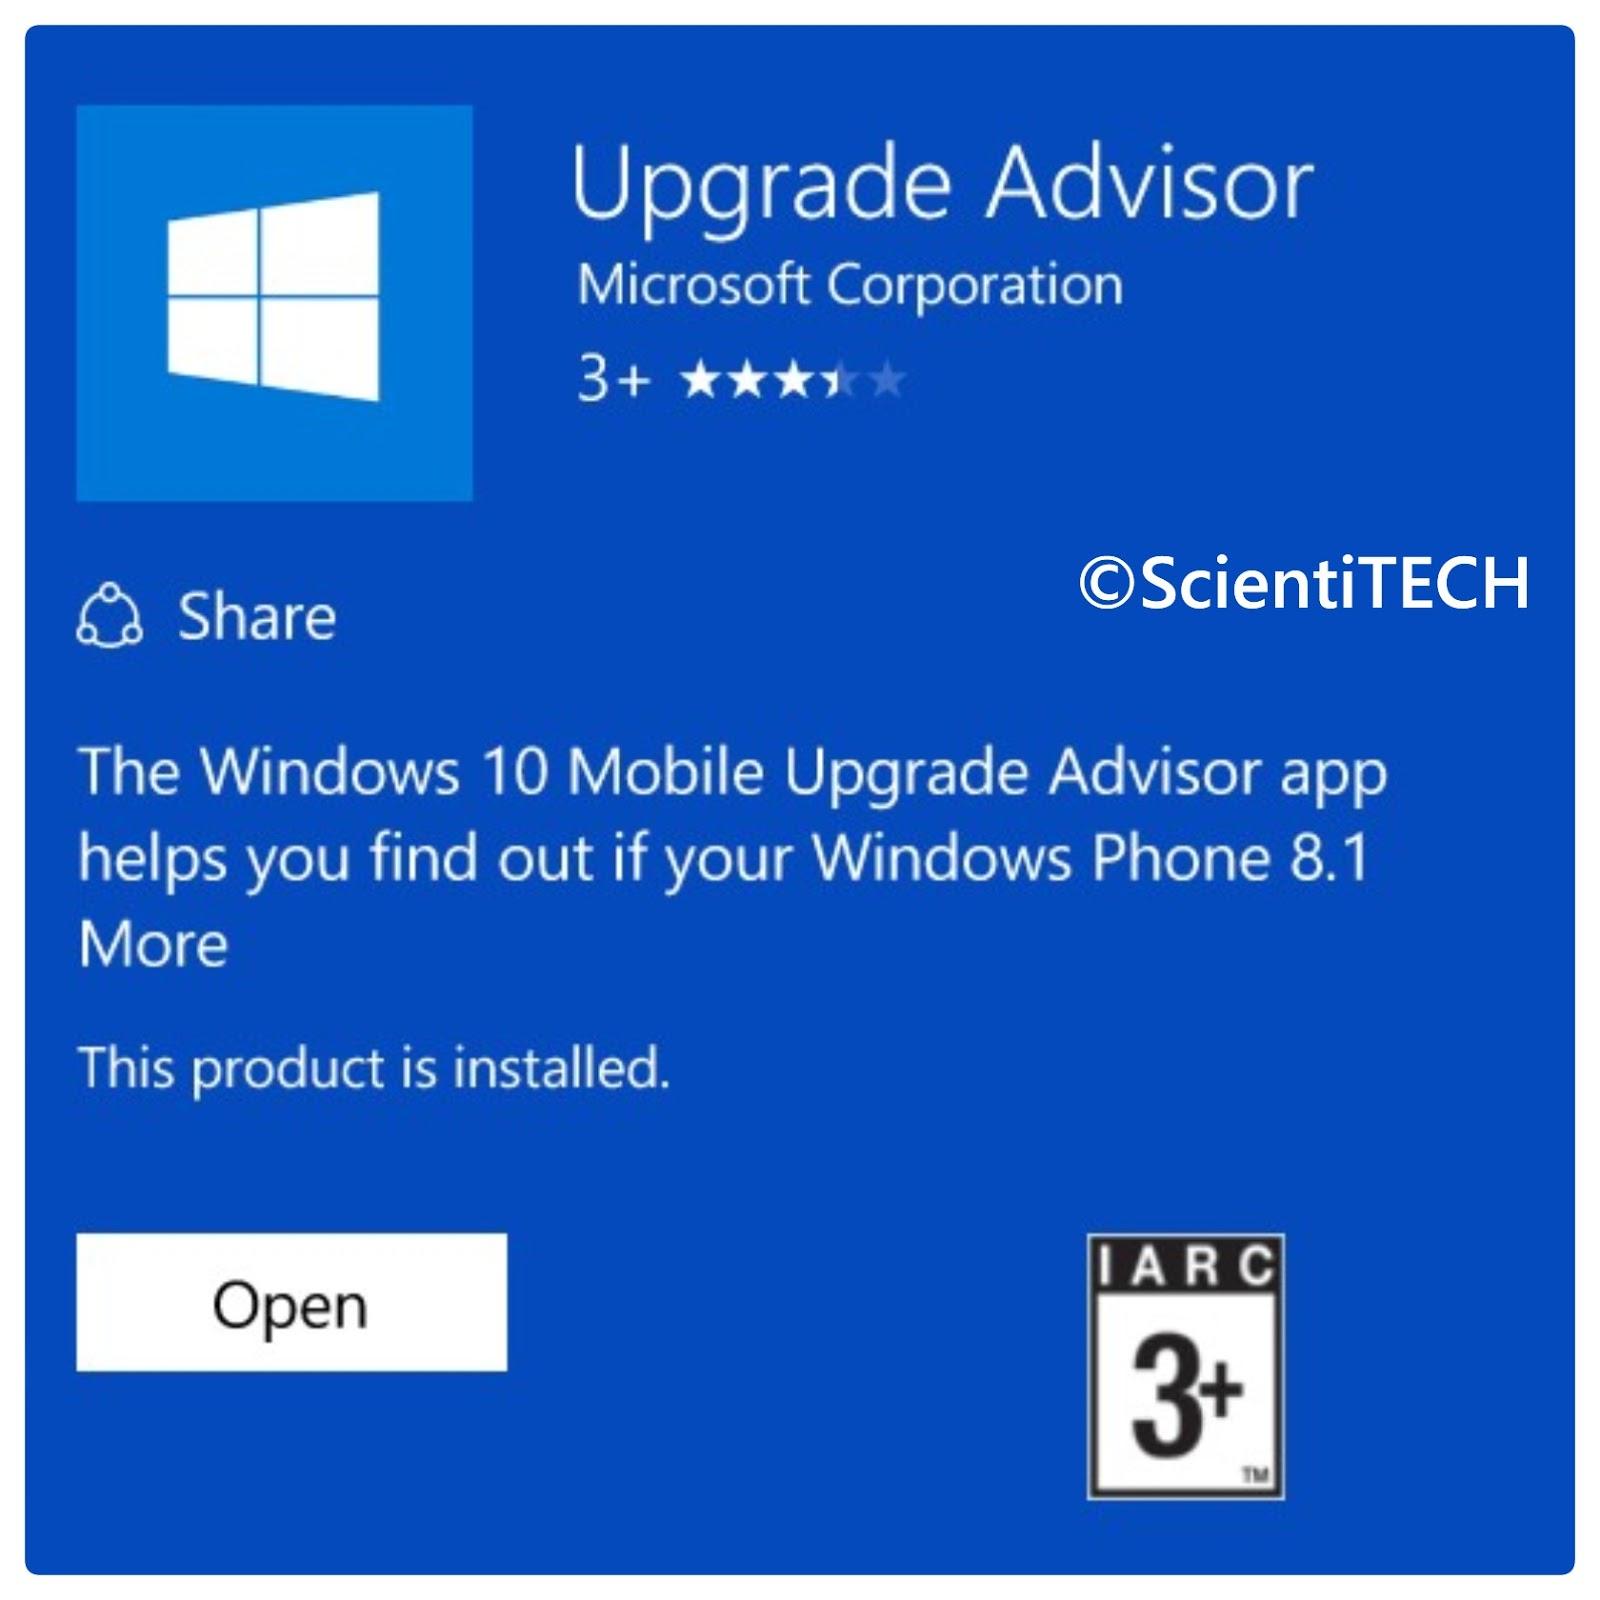 upgrade advisor download